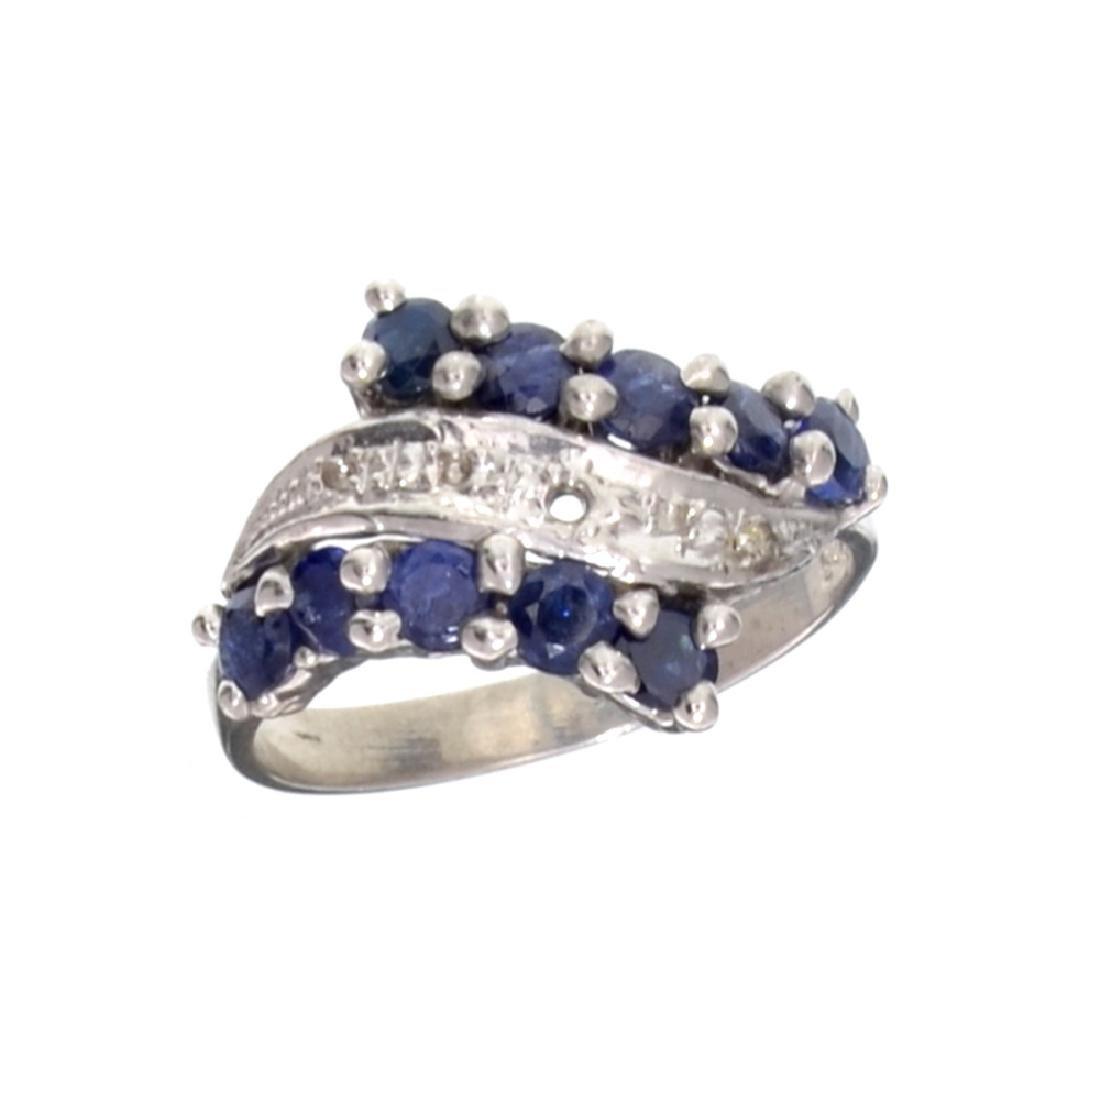 APP: 0.5k Fine Jewelry Designer Sebastian 1.20CT Oval